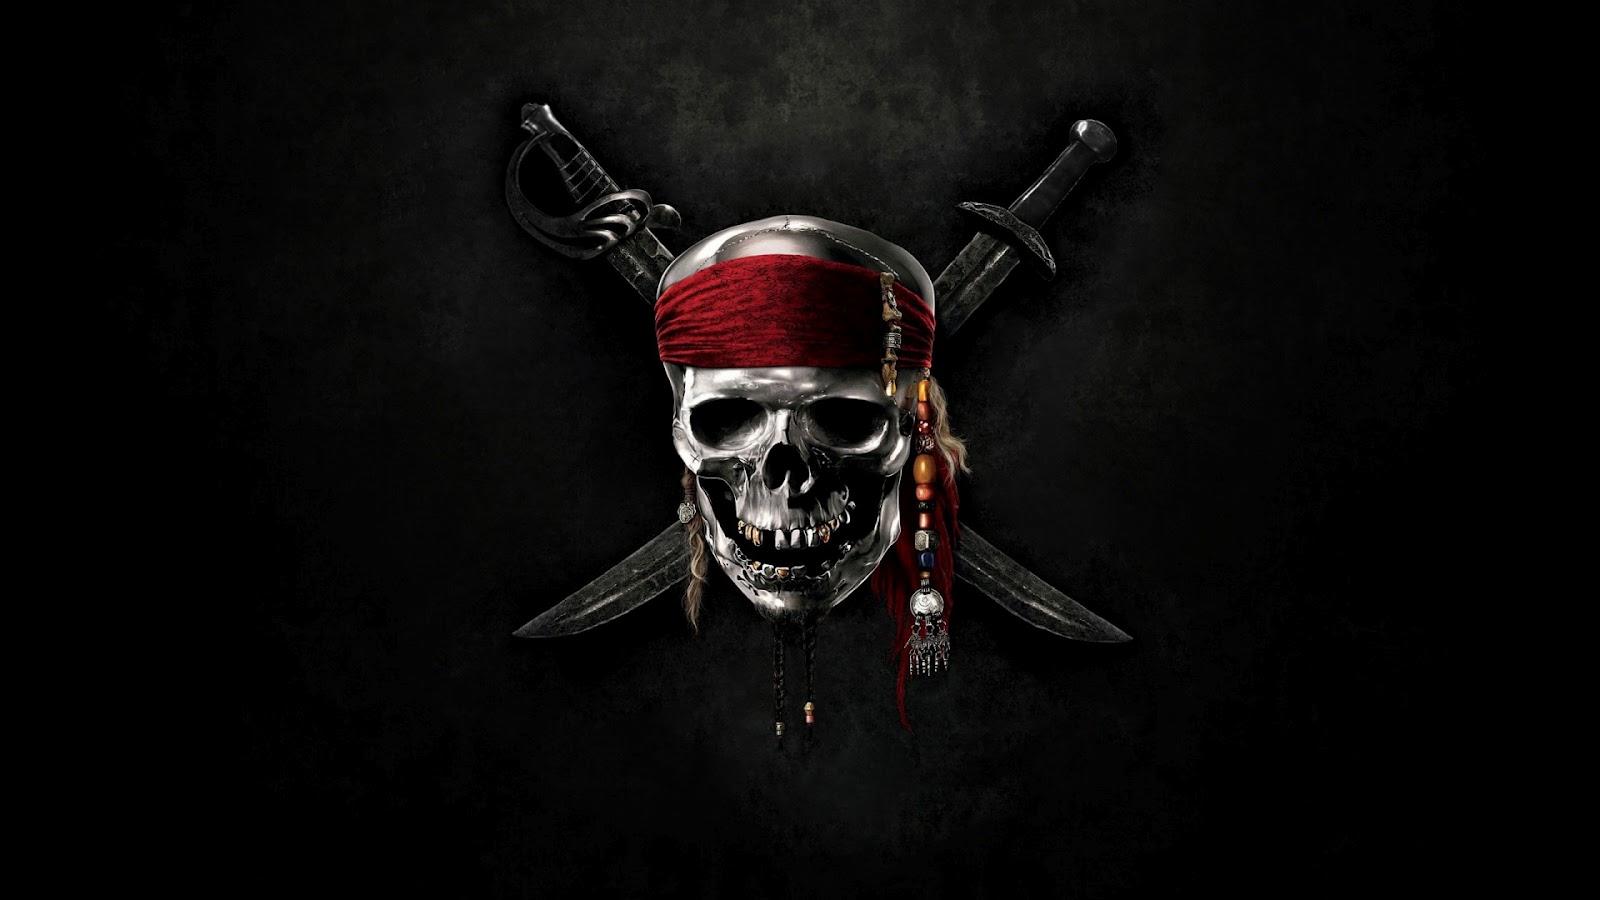 pirates wallpaper mario - photo #44